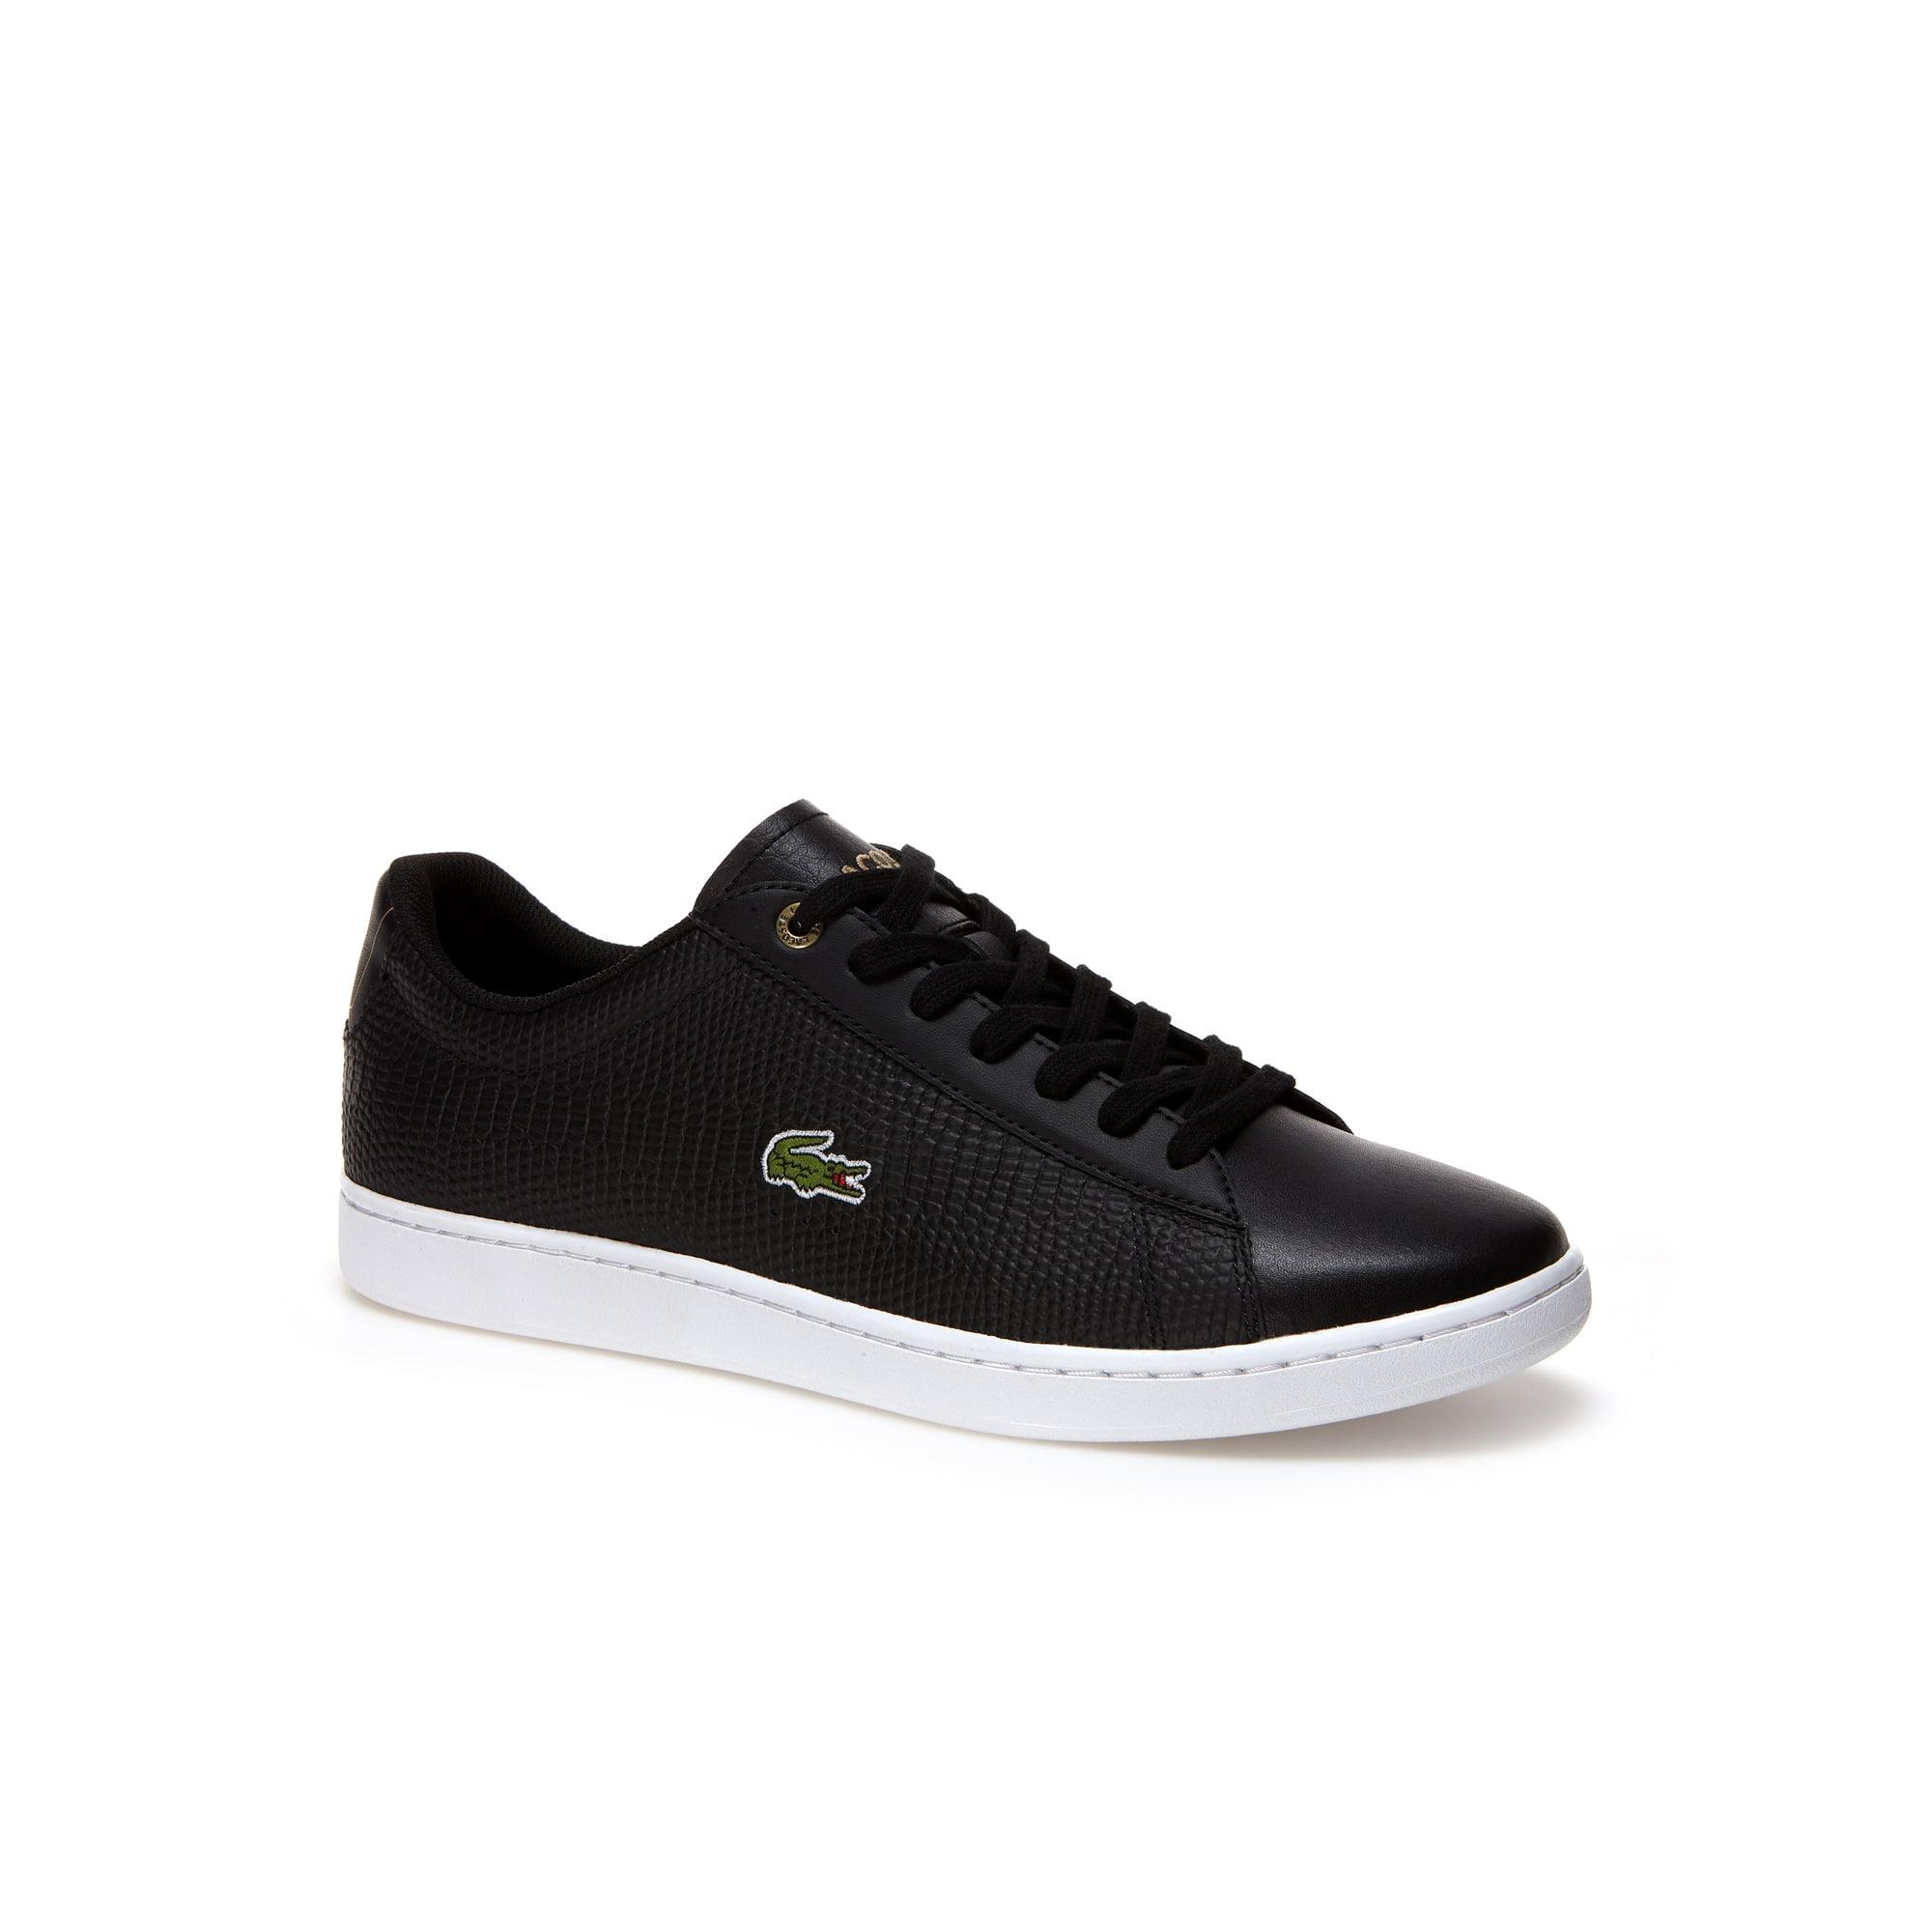 Sneakers Carnaby Evo in pelle nappa premium